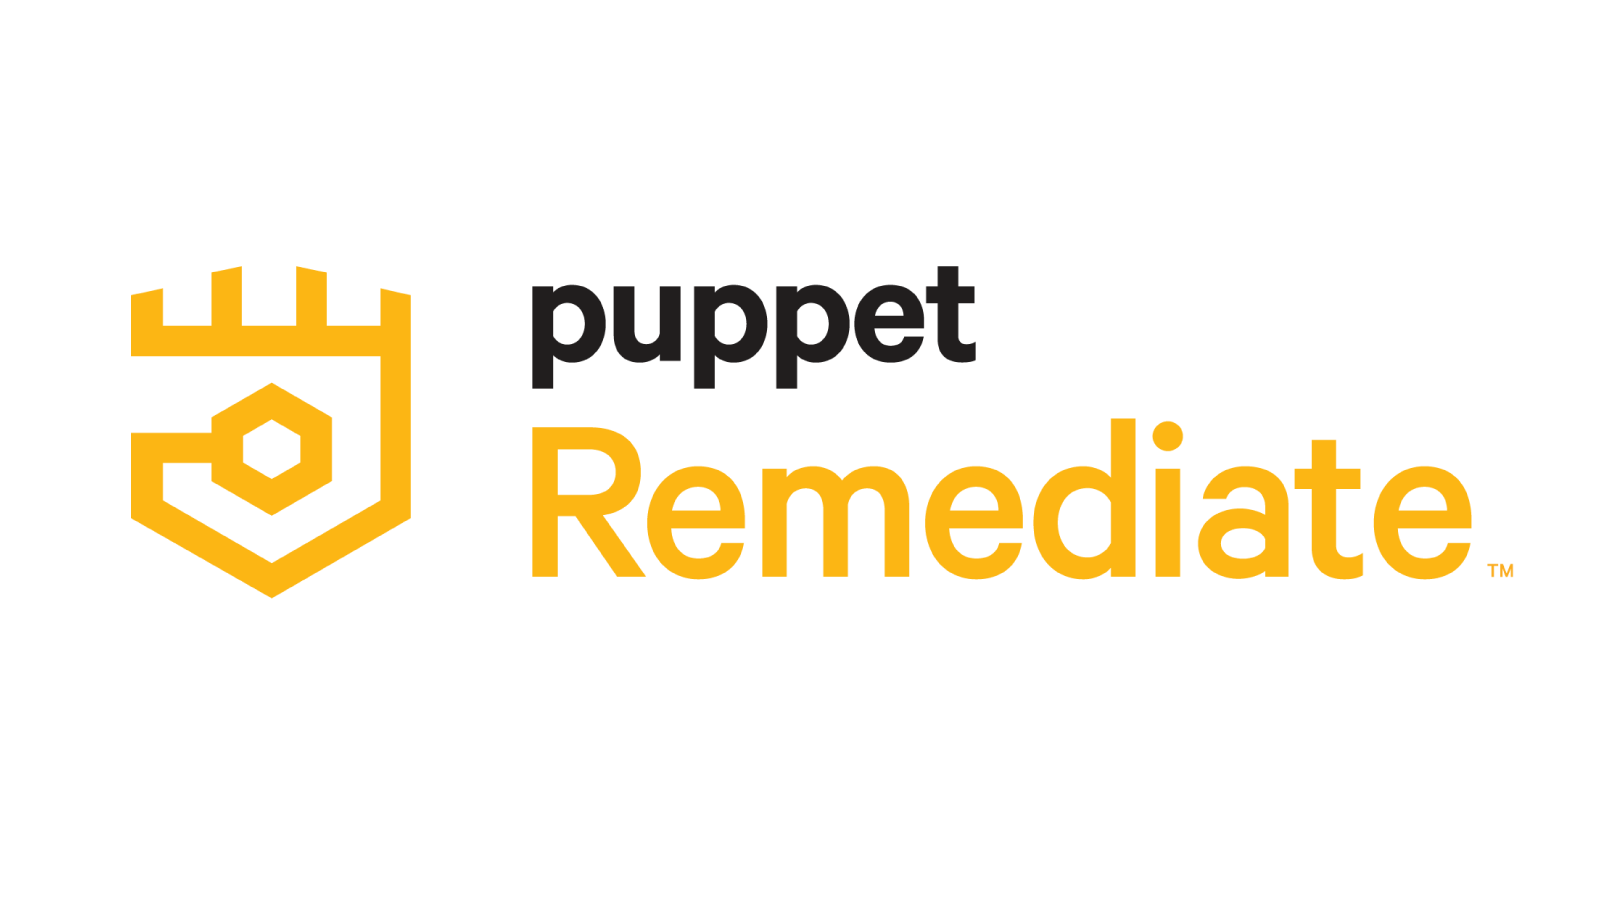 Puppet Remediate logo